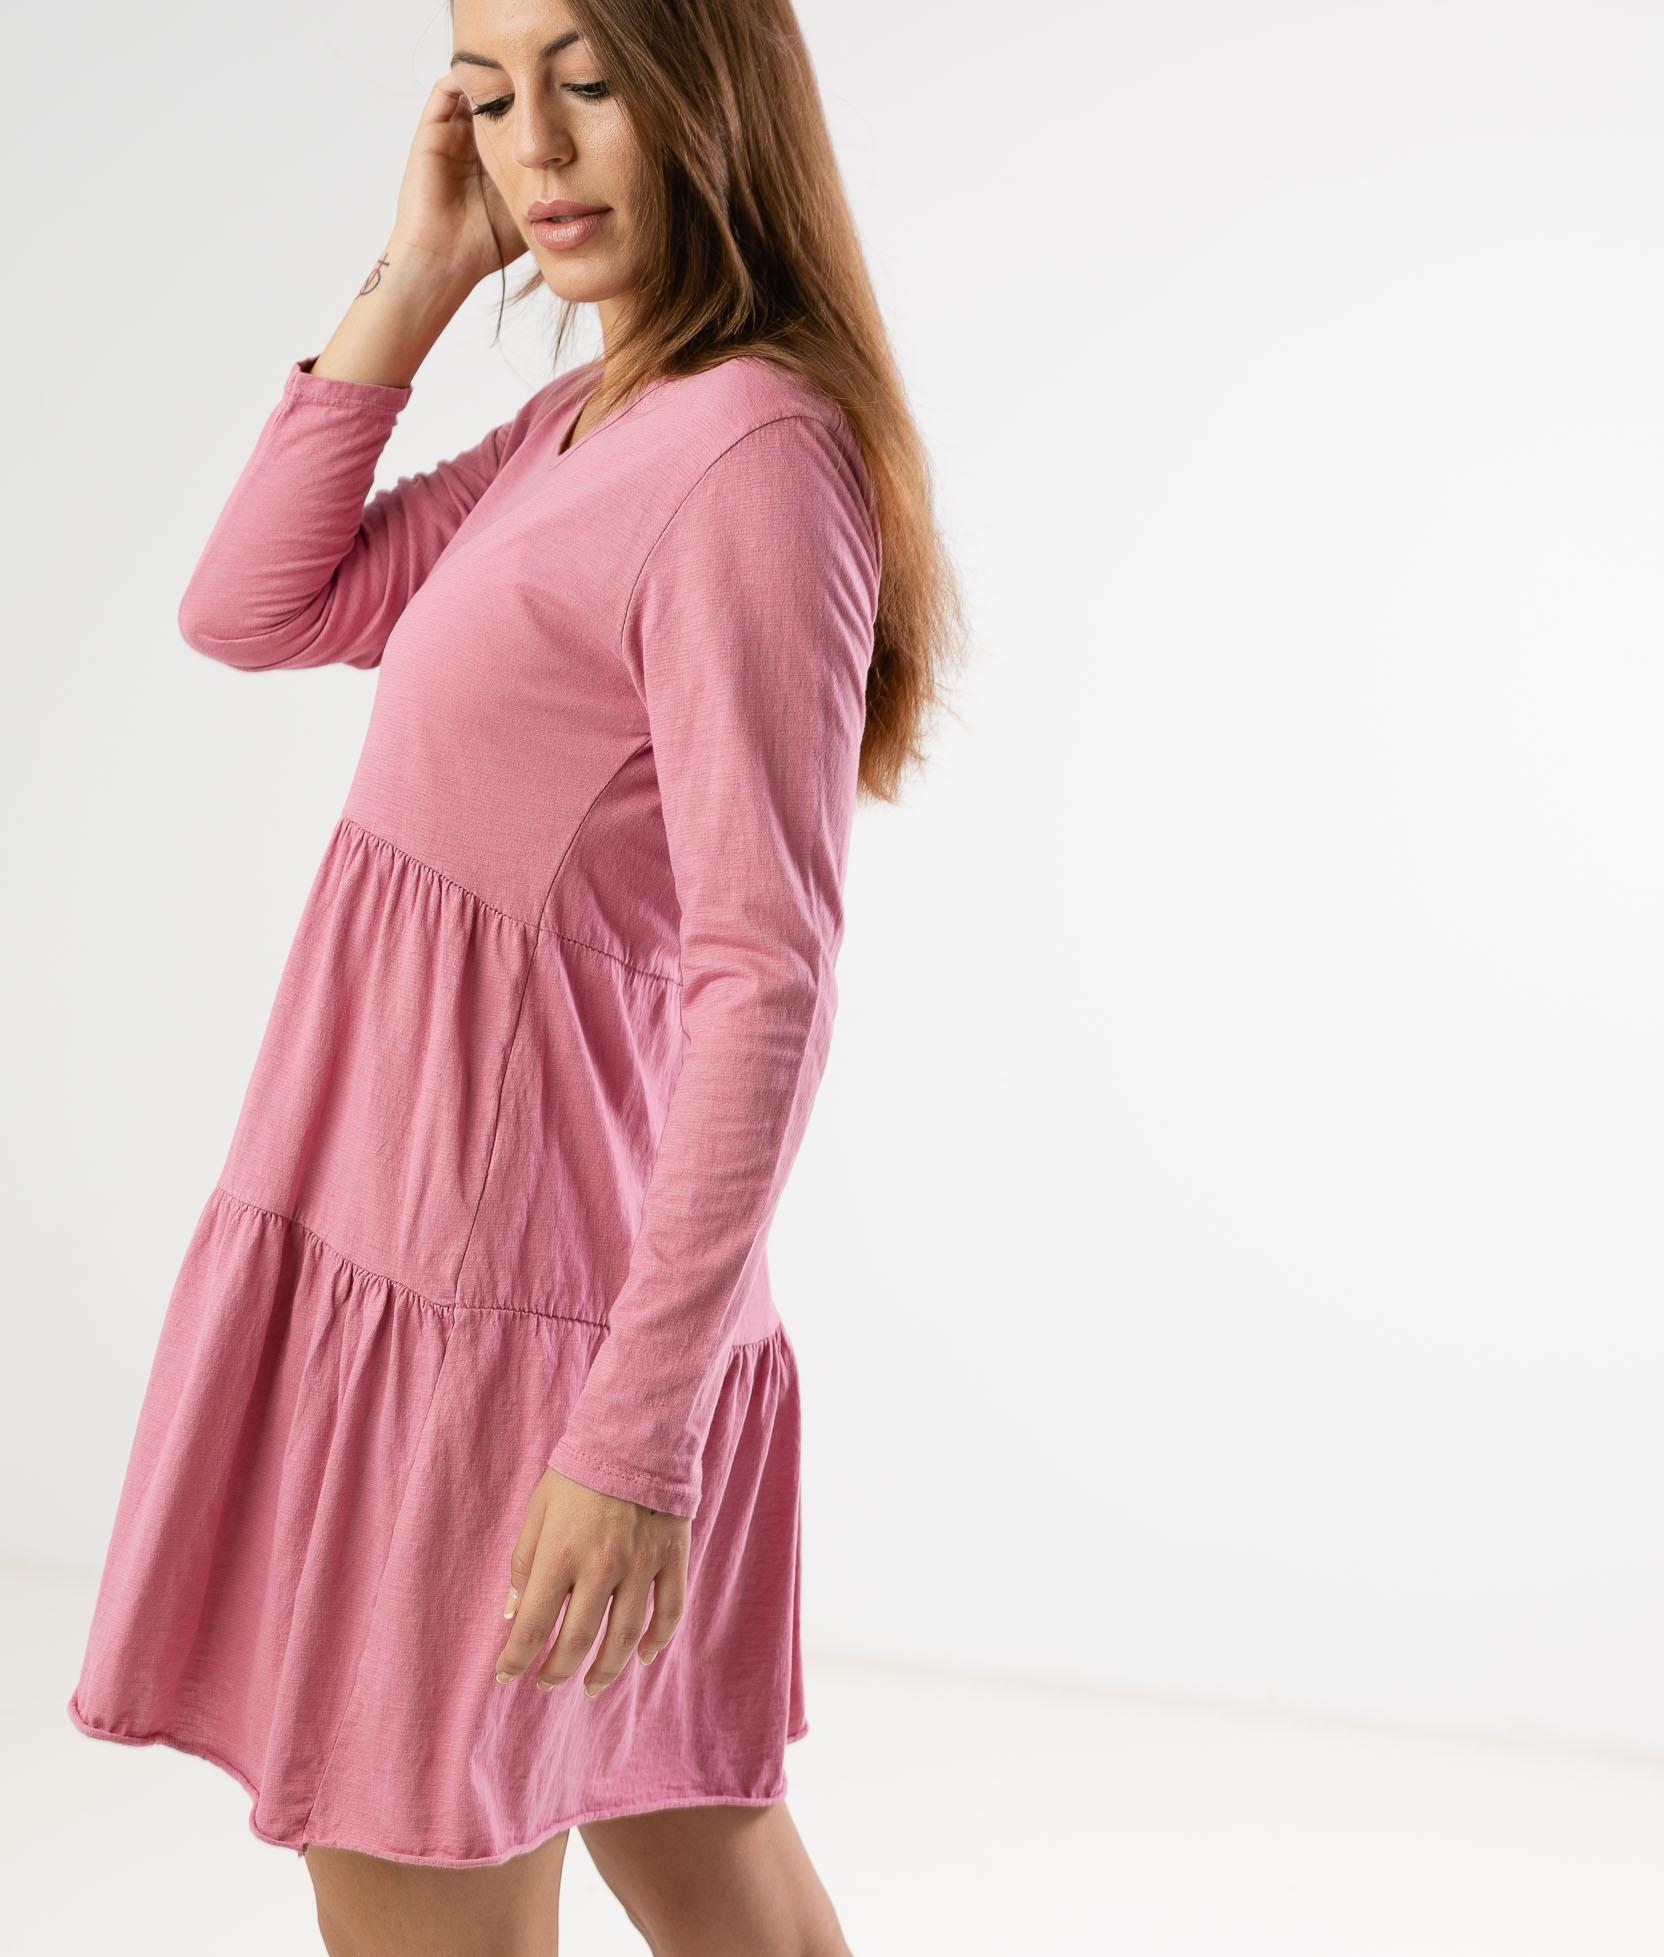 CIMERA DRESS - PINK